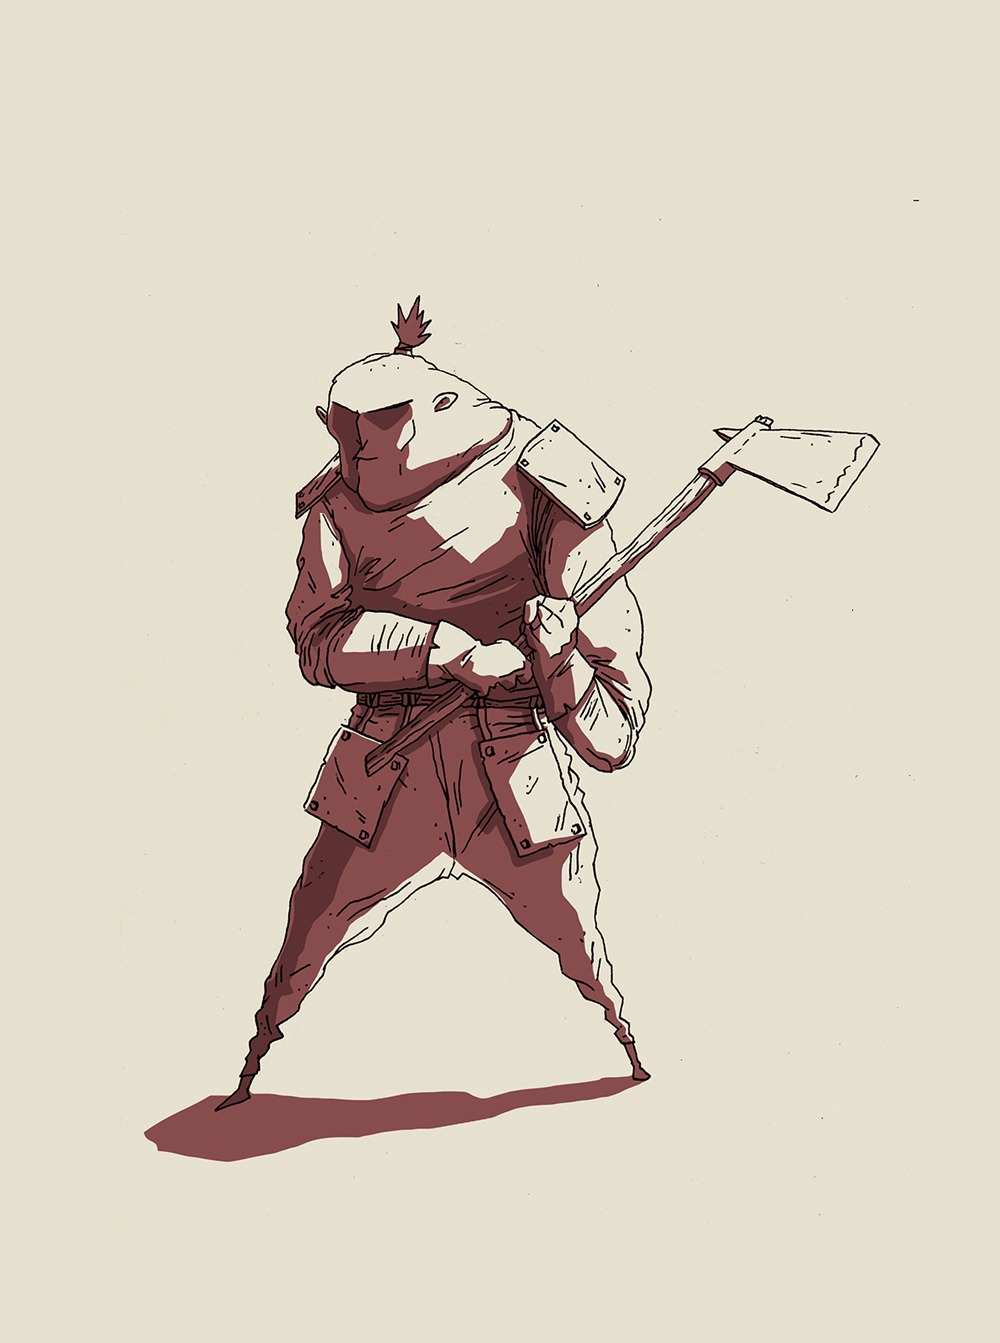 Character Design Shuffle App : Character design shuffle on behance